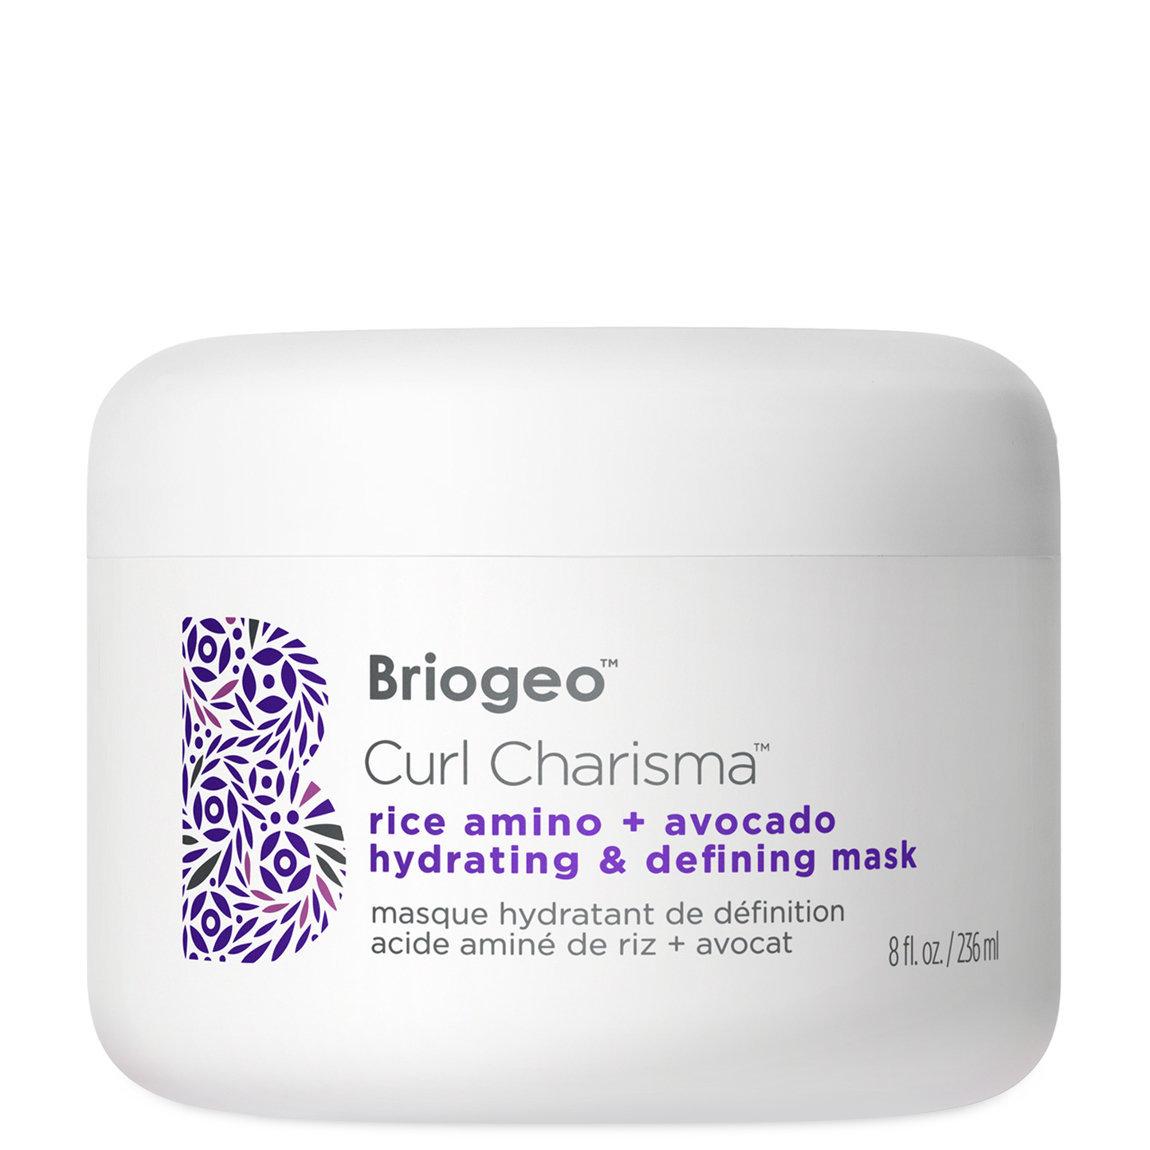 Briogeo Curl Charisma Rice Amino + Avocado Hydrating & Defining Hair Mask 8 fl oz alternative view 1 - product swatch.